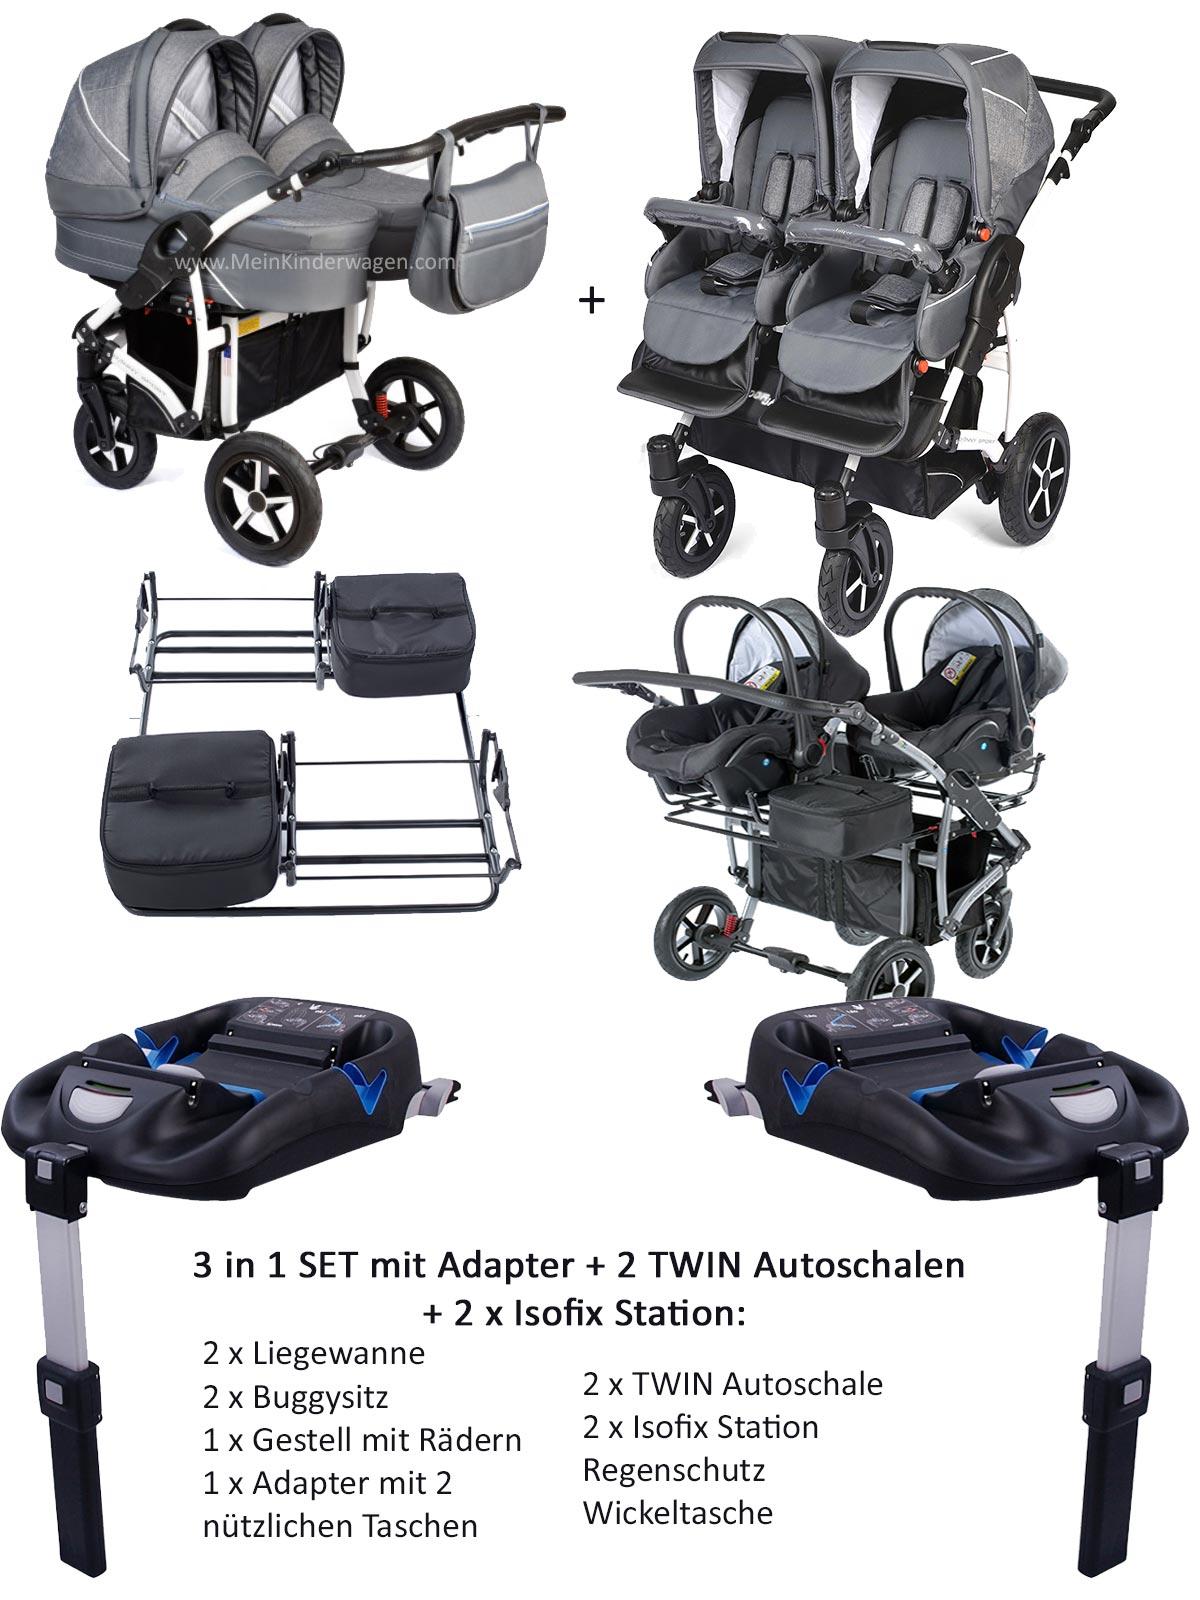 zwillingskinderwagen zum top preis. Black Bedroom Furniture Sets. Home Design Ideas